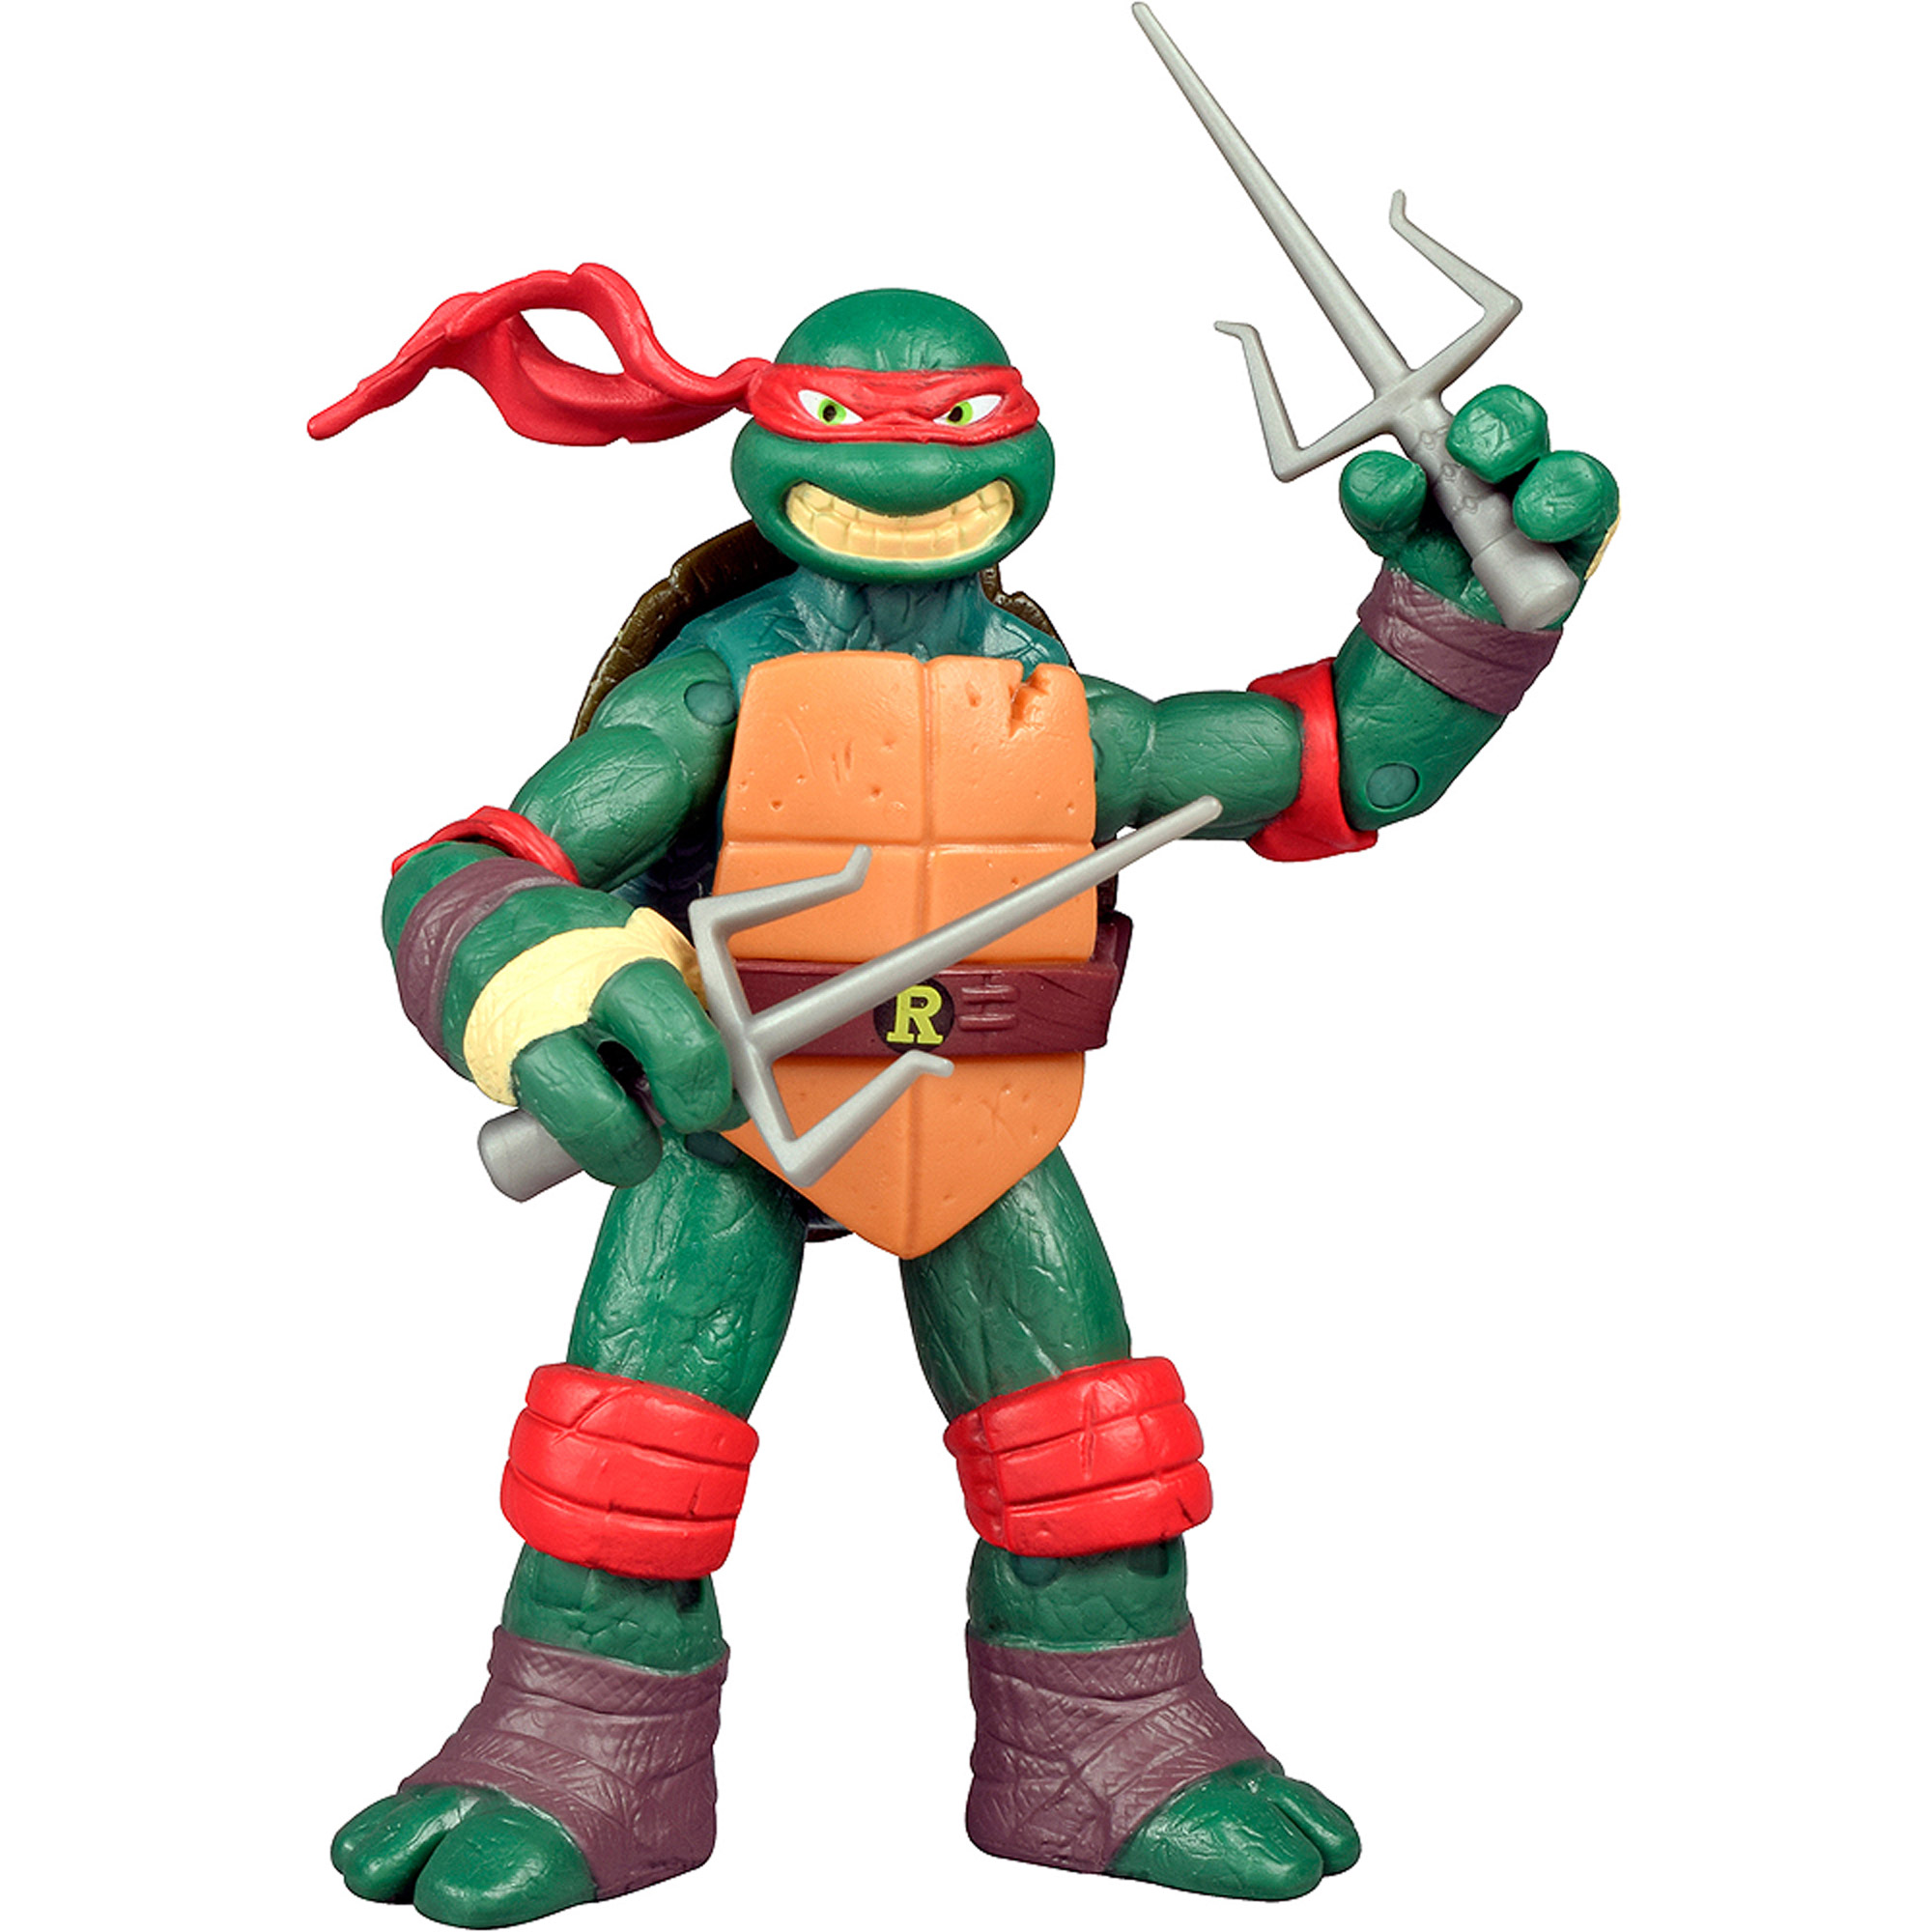 Nickelodeon Teenage Mutant Ninja Turtles Re-Deco Action Figure, Raphael